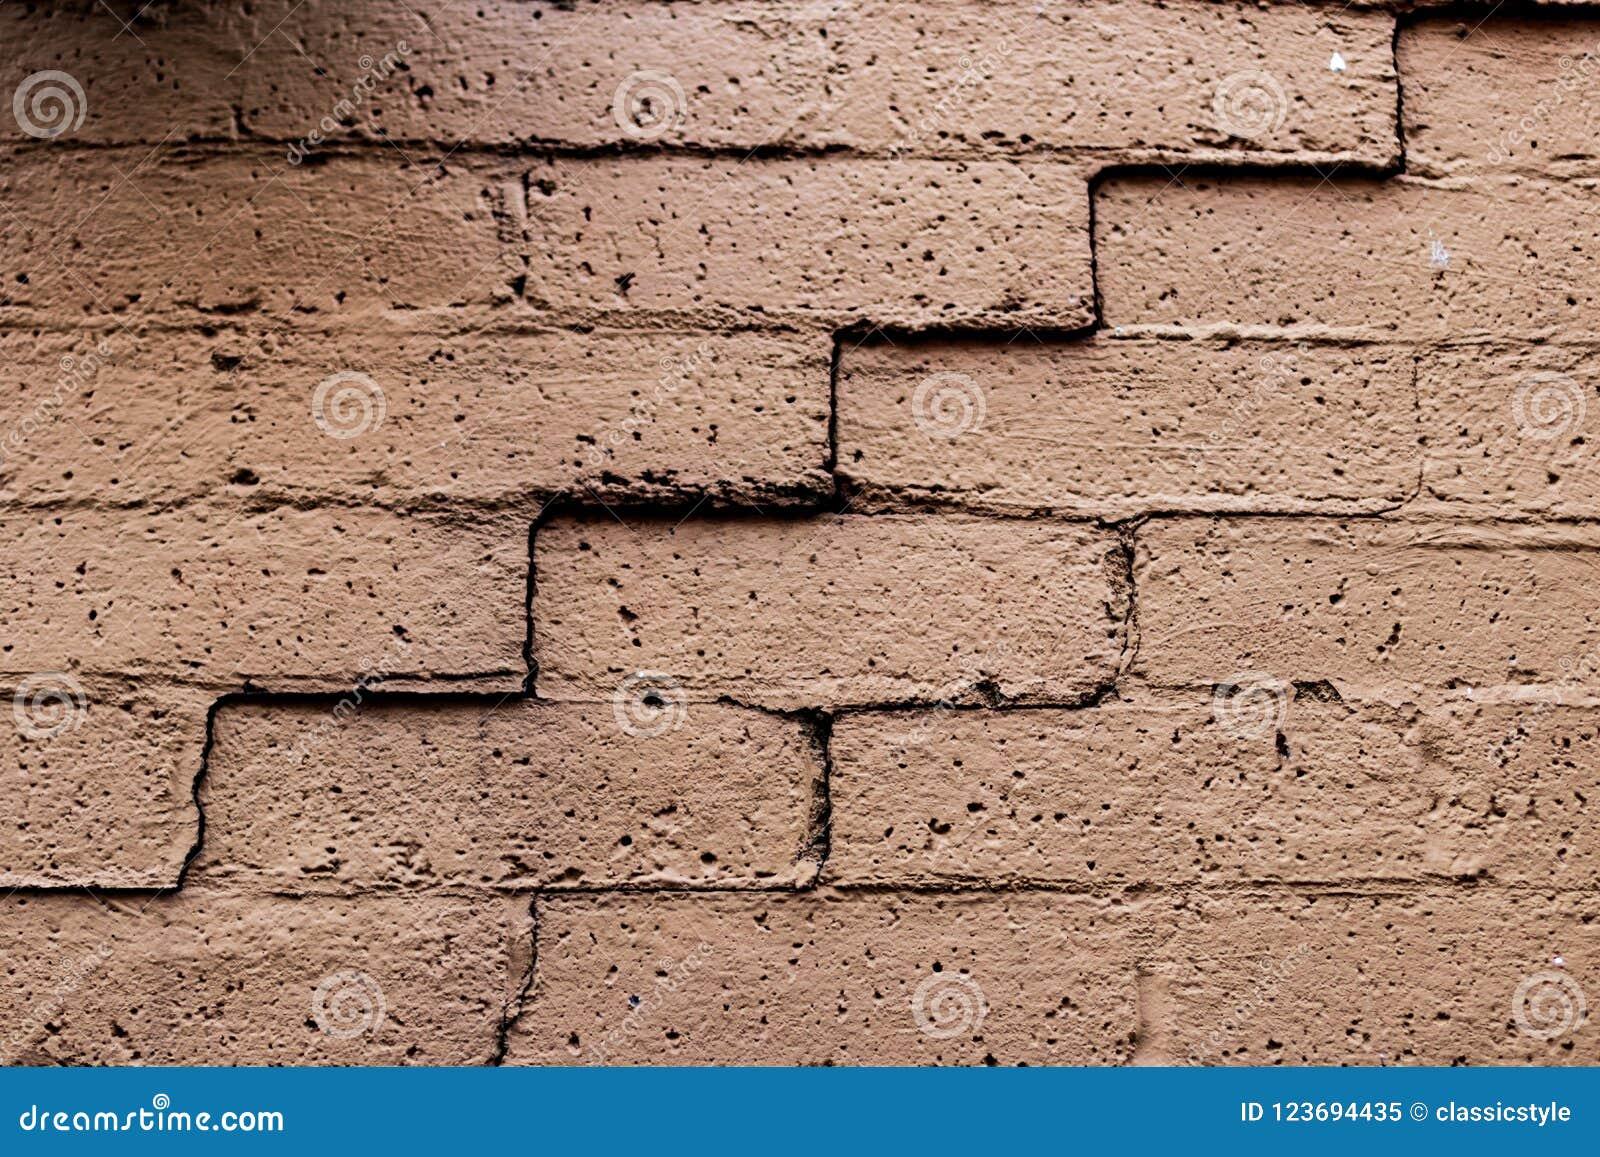 Старая увяданная треснутая кирпичная стена